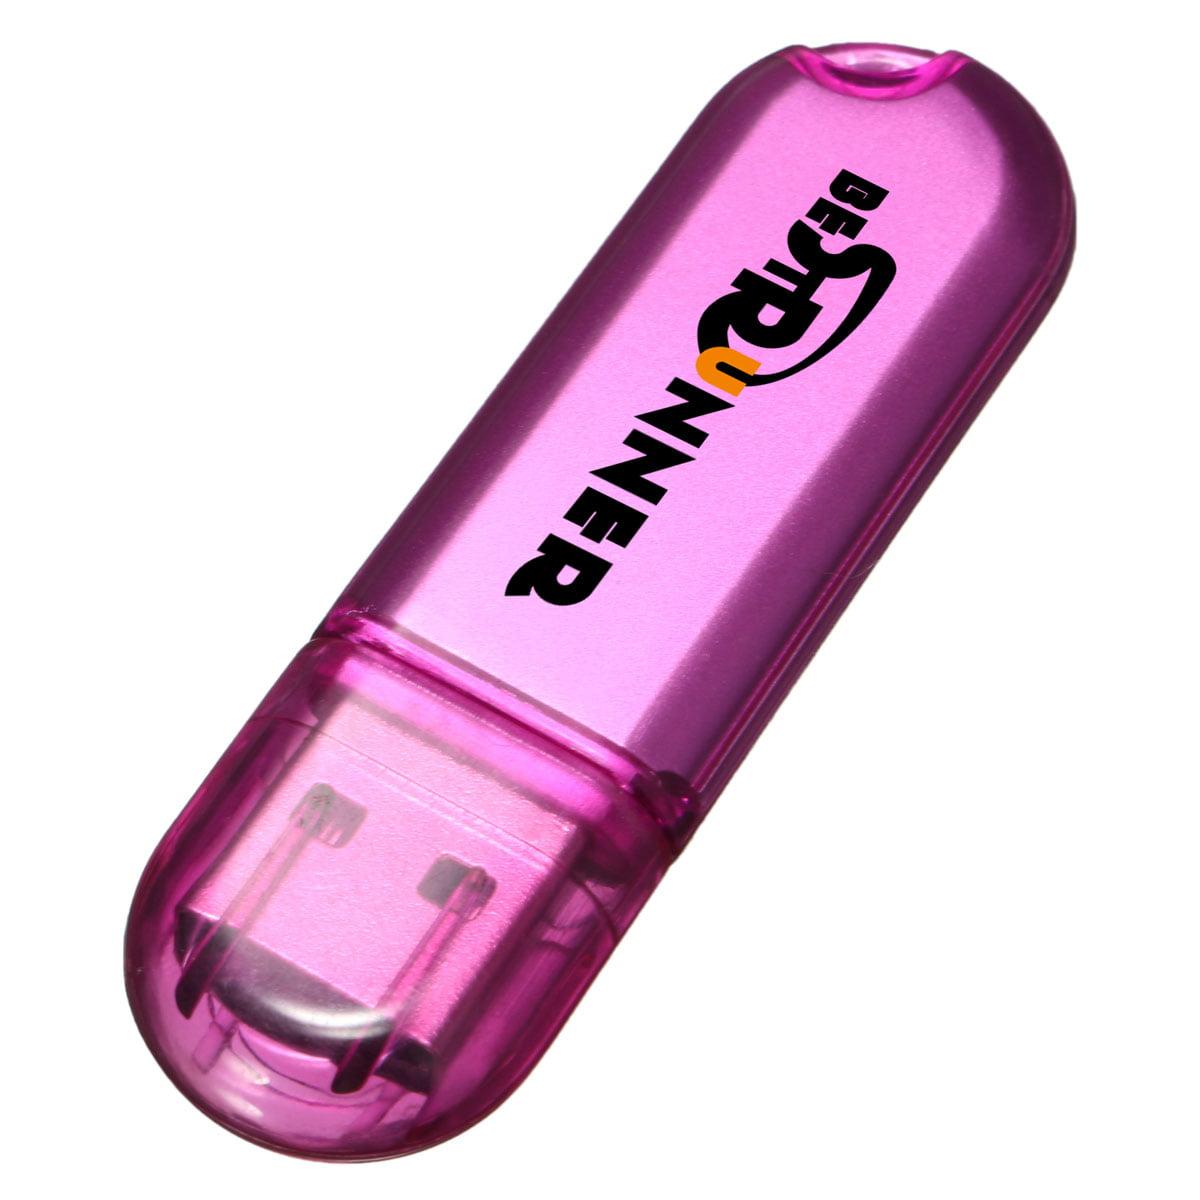 BESTRUNNER 32G USB 2.0 Flash Driver Memory Stick Storage Thumb Pen Disk,White color